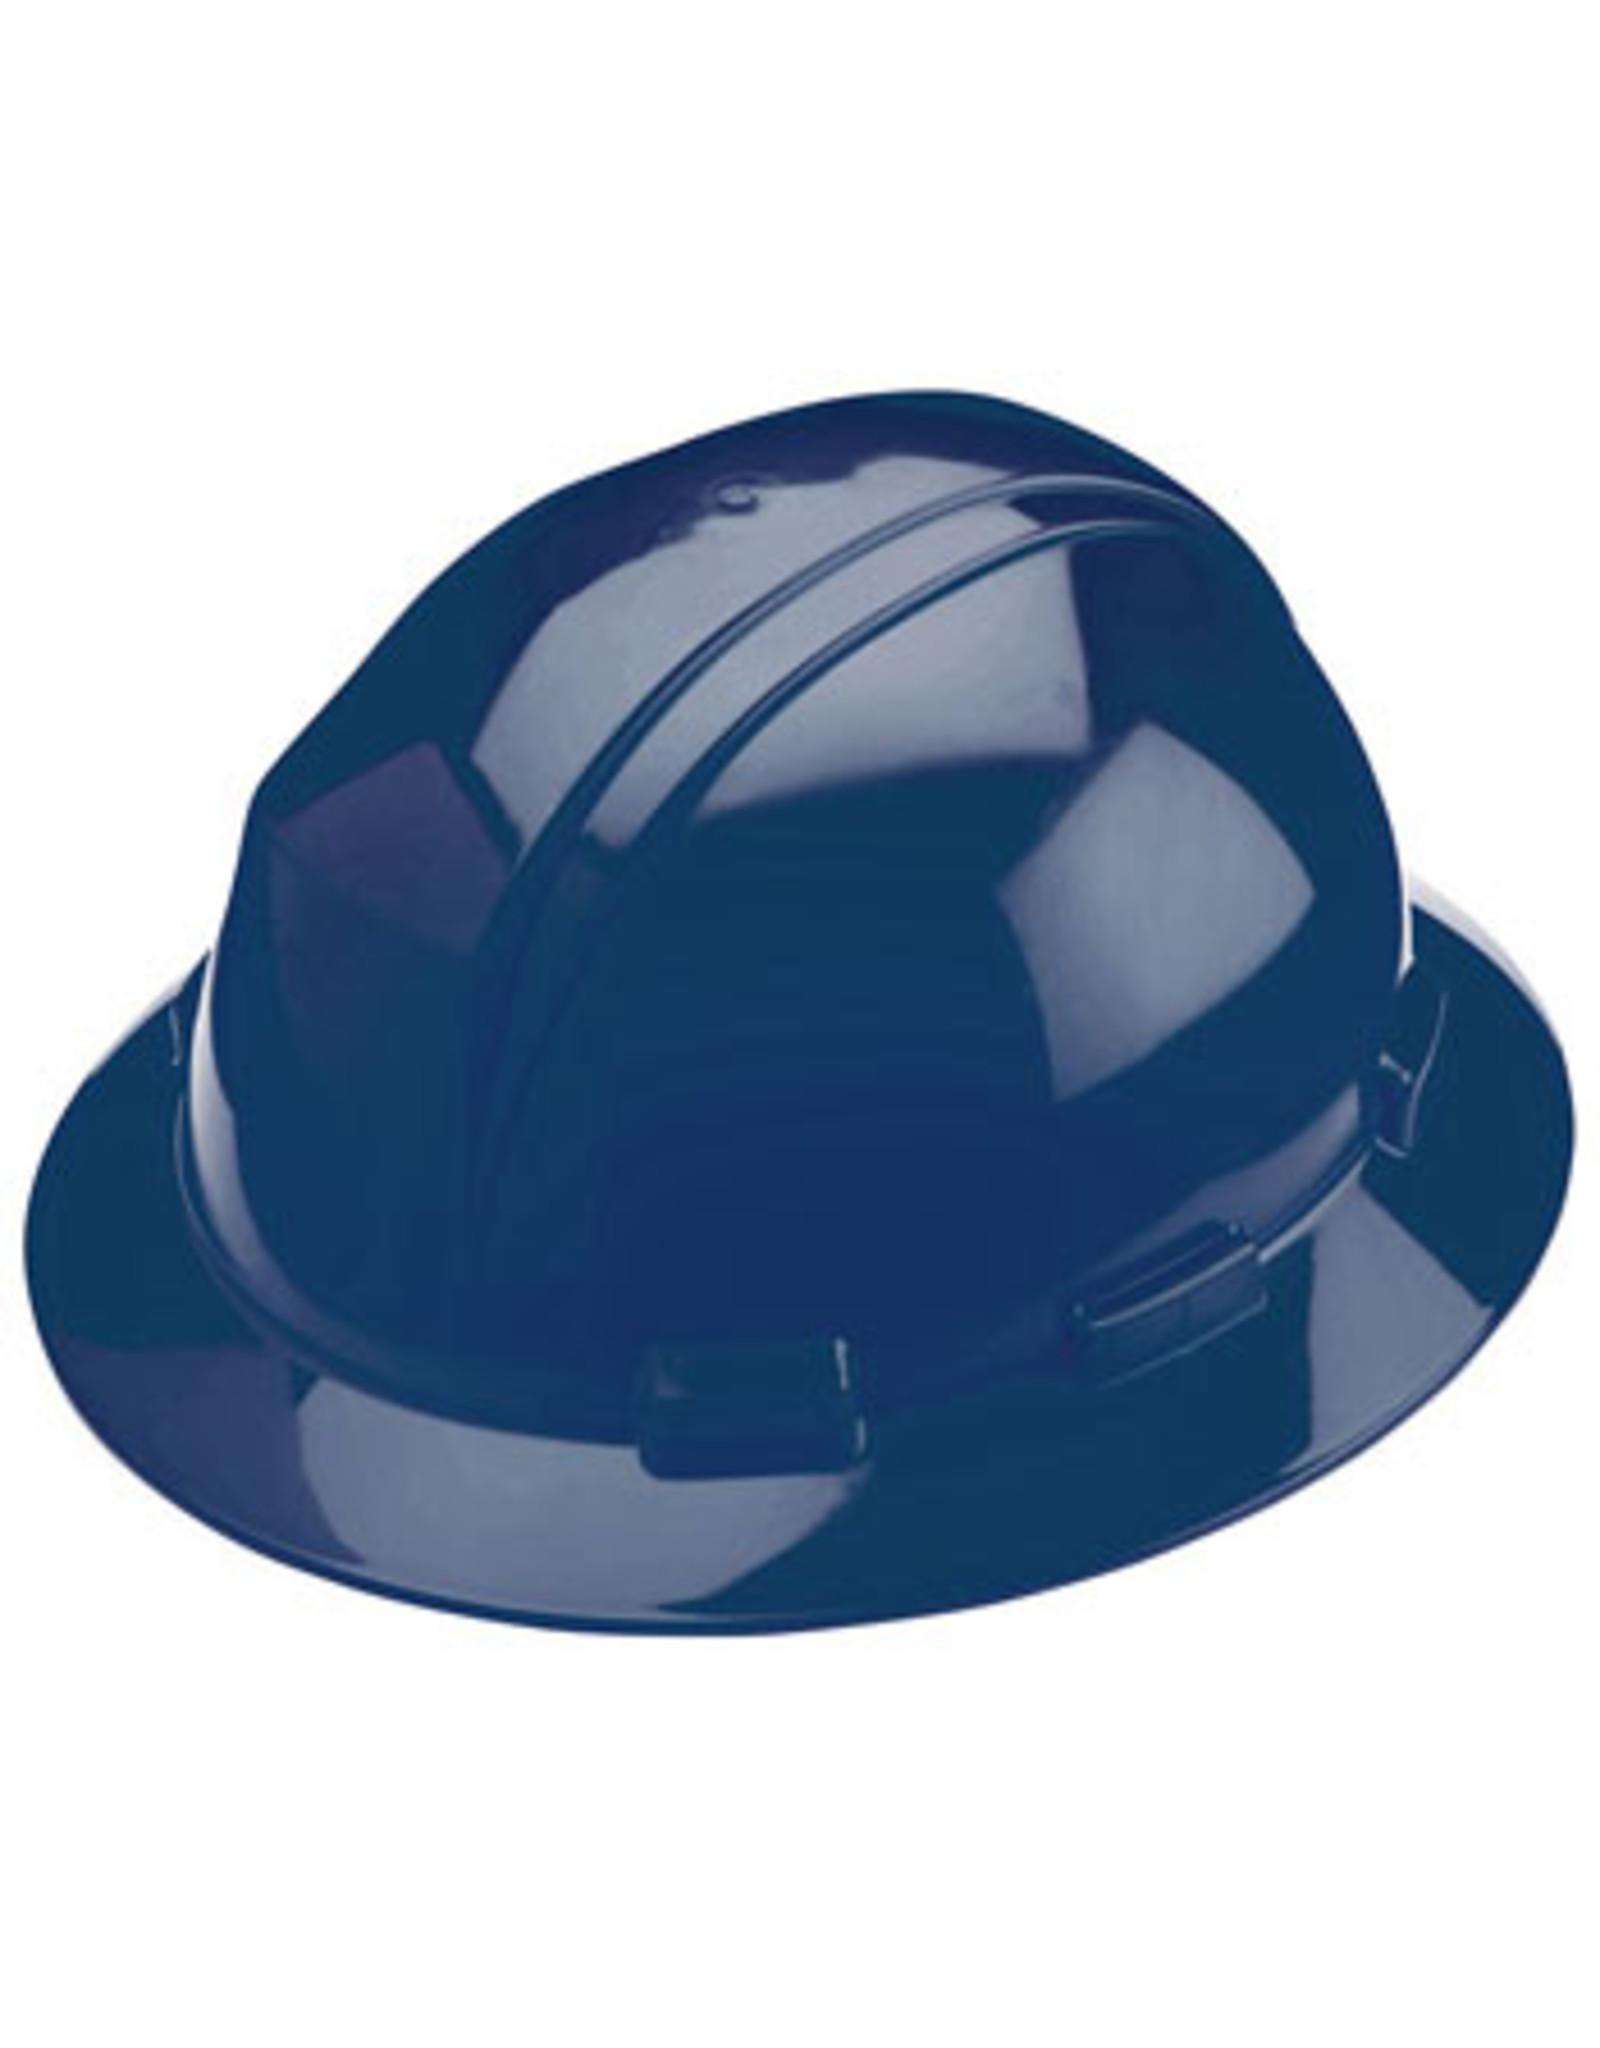 KILIMANJARO SAFETY HAT TYPE 2 - ''SURE-LOCK'' RATCHET